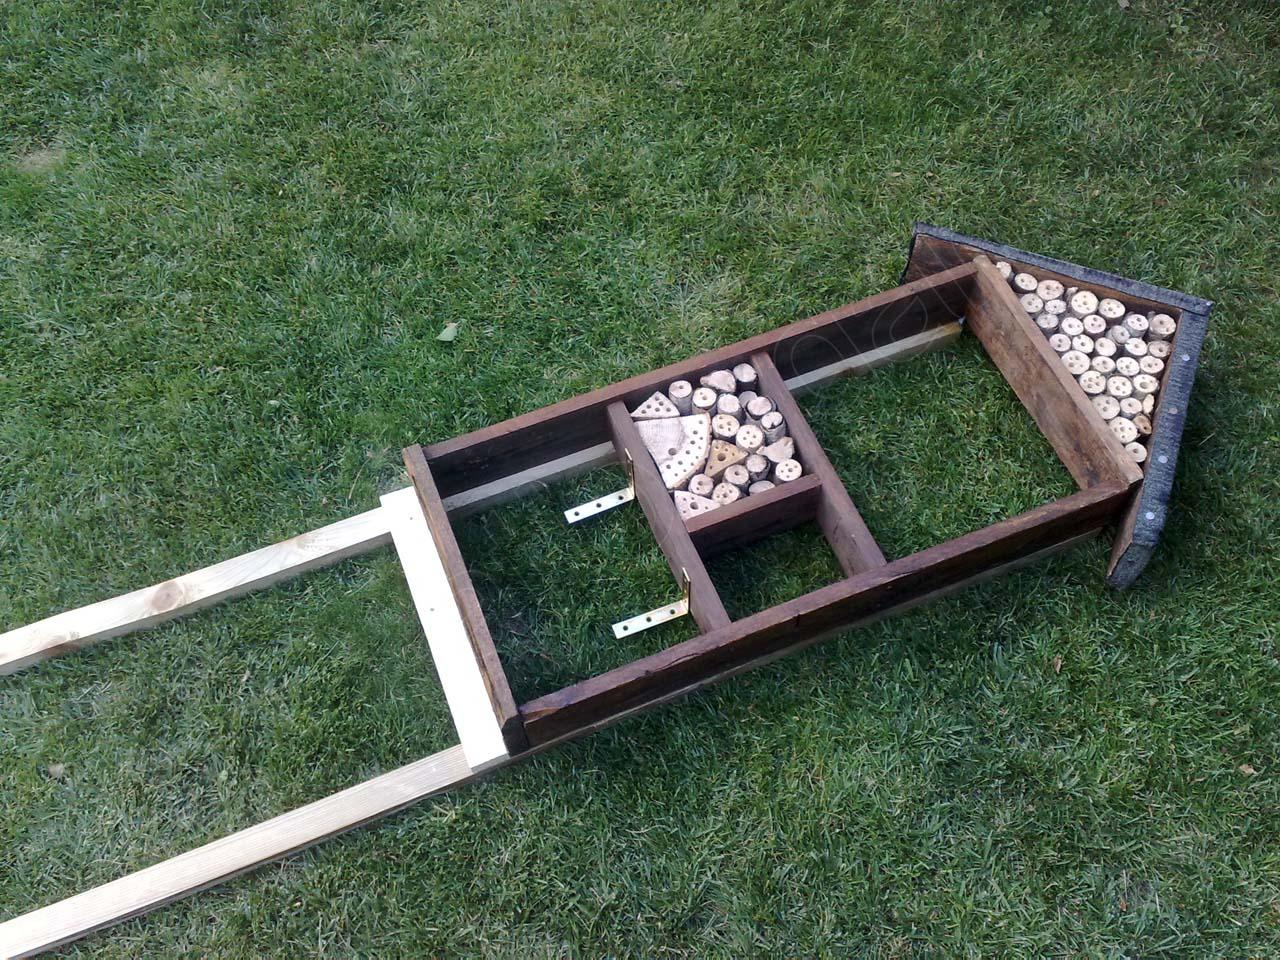 projekt insektenhotel aus resten bauen teil 3. Black Bedroom Furniture Sets. Home Design Ideas